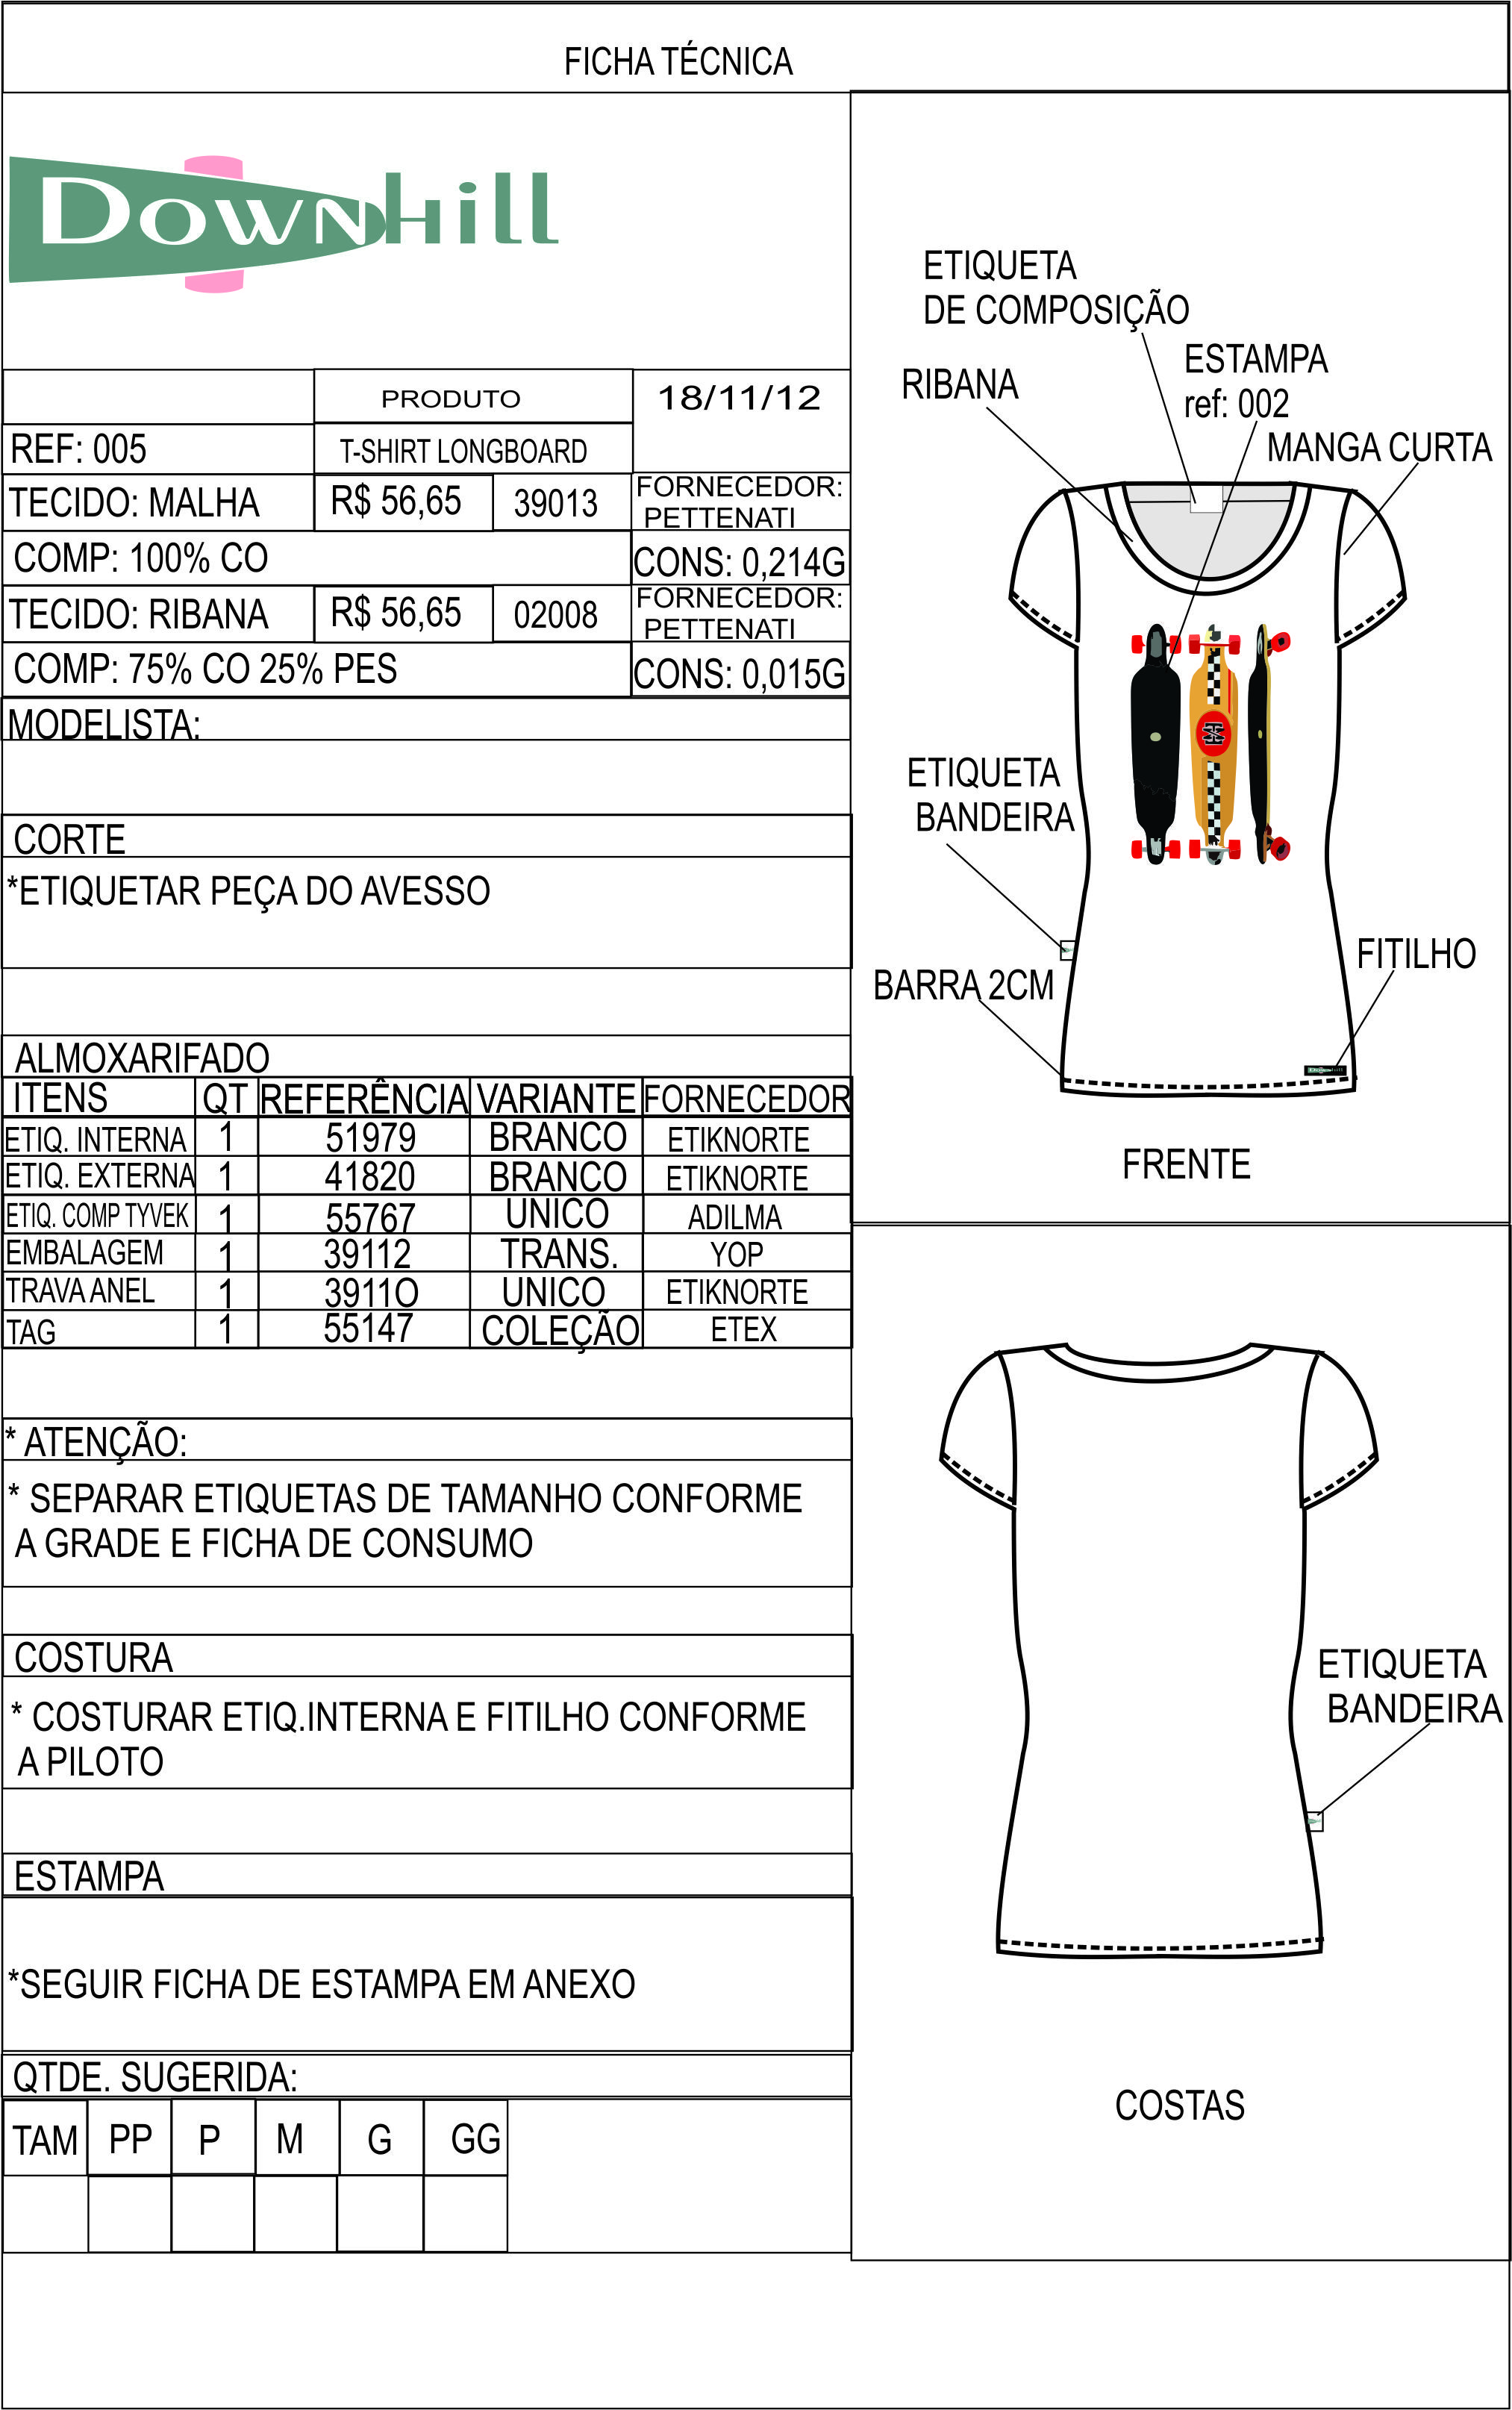 FICHA TÉCNICA2 | Technical Drawing | Pinterest